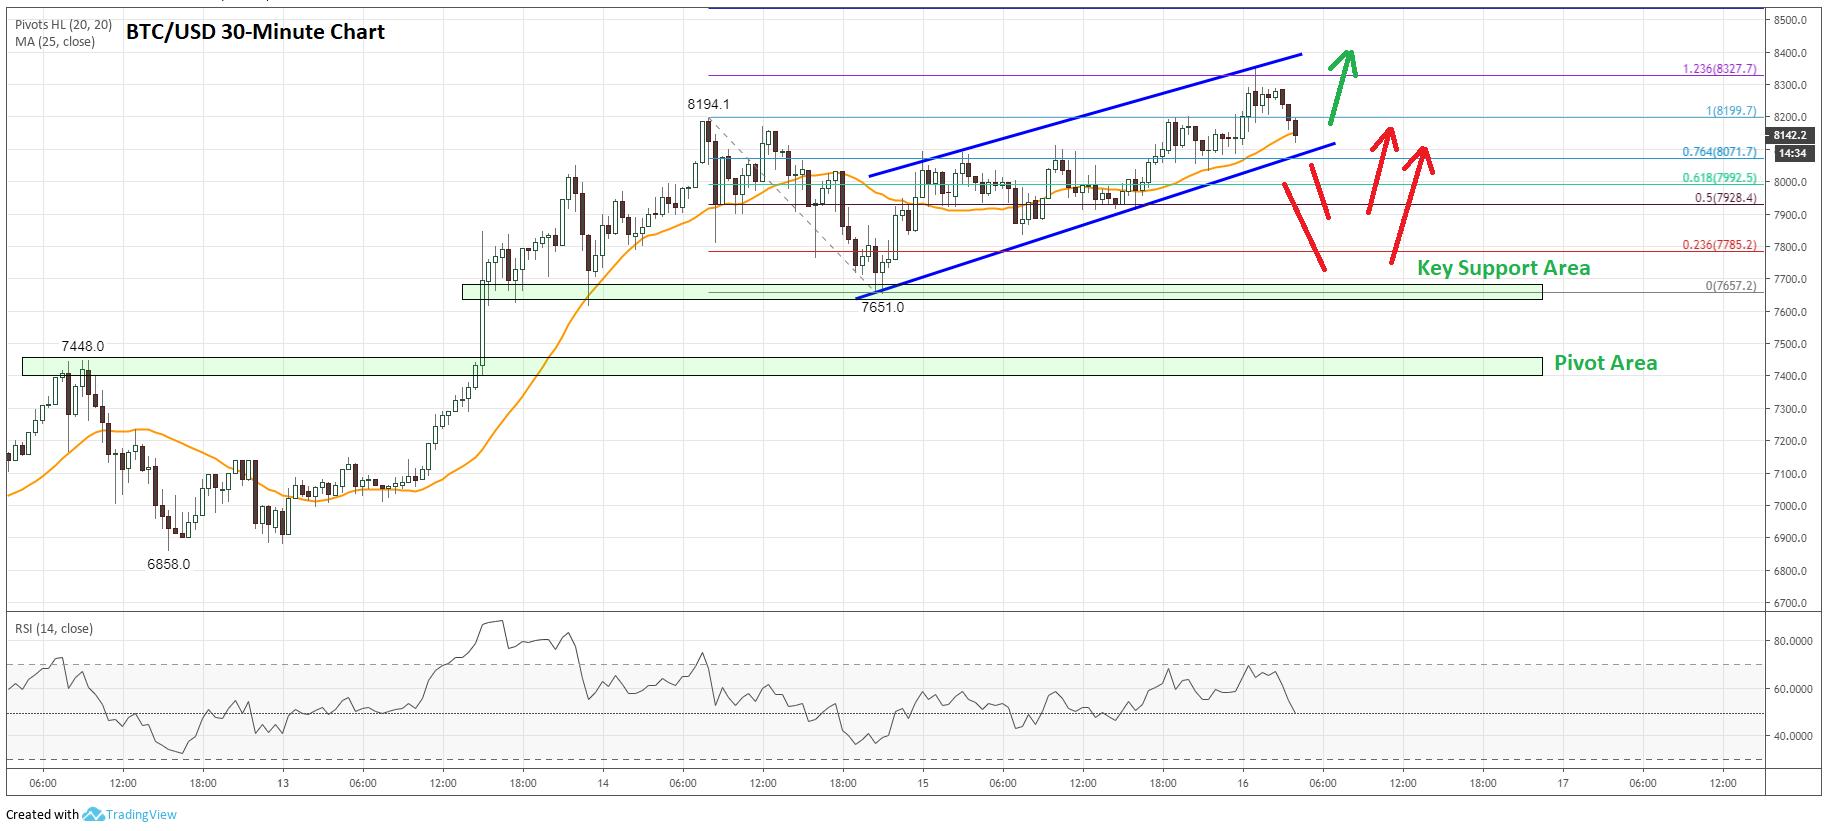 Bitcoin Price Analysis (BTC to USD) Chart